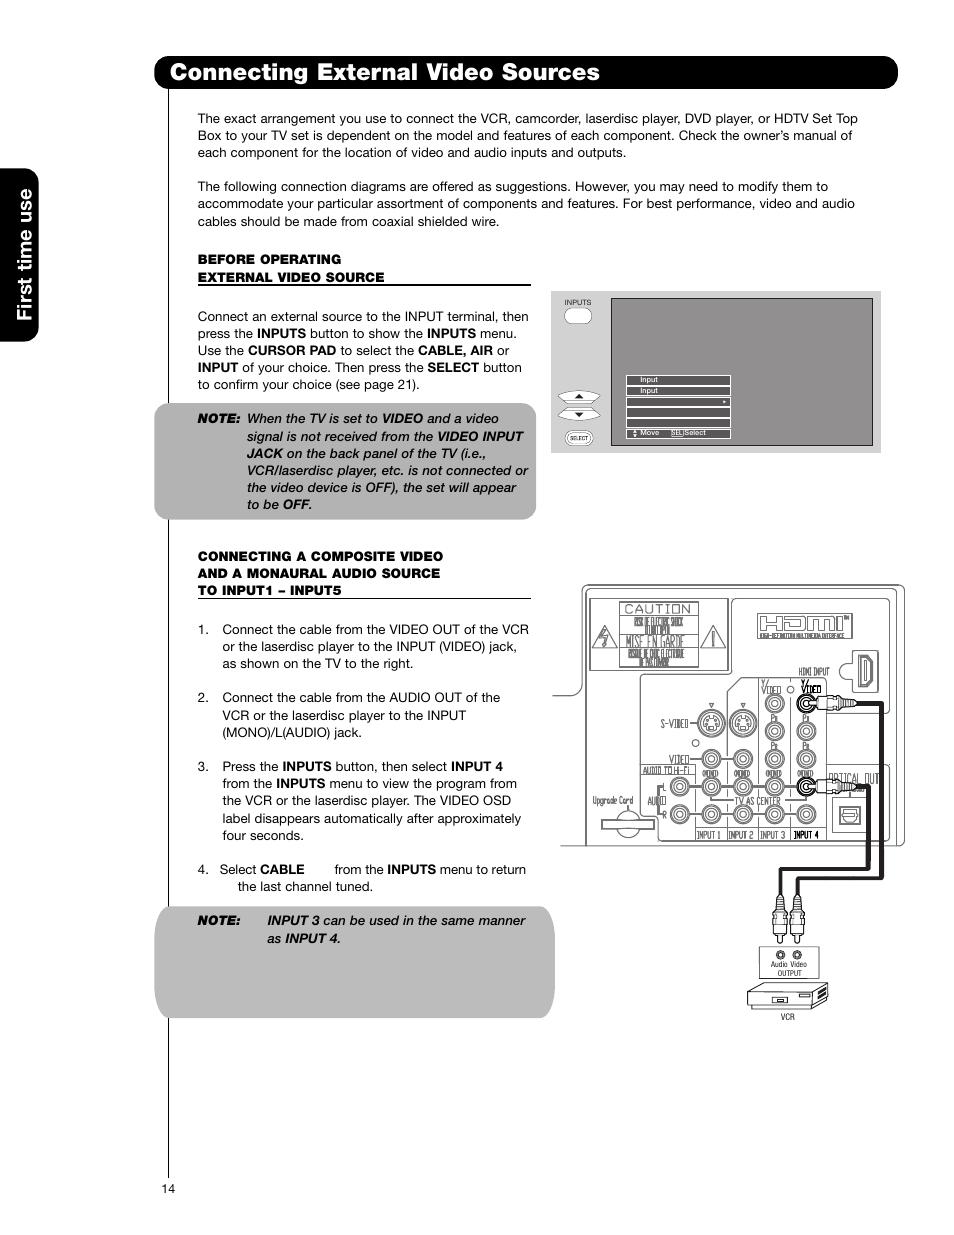 connecting external video sources first time use hitachi 51f59 rh manualsdir com Hitachi 51F59A Lamp Replacement Hitachi 51F59A Manual